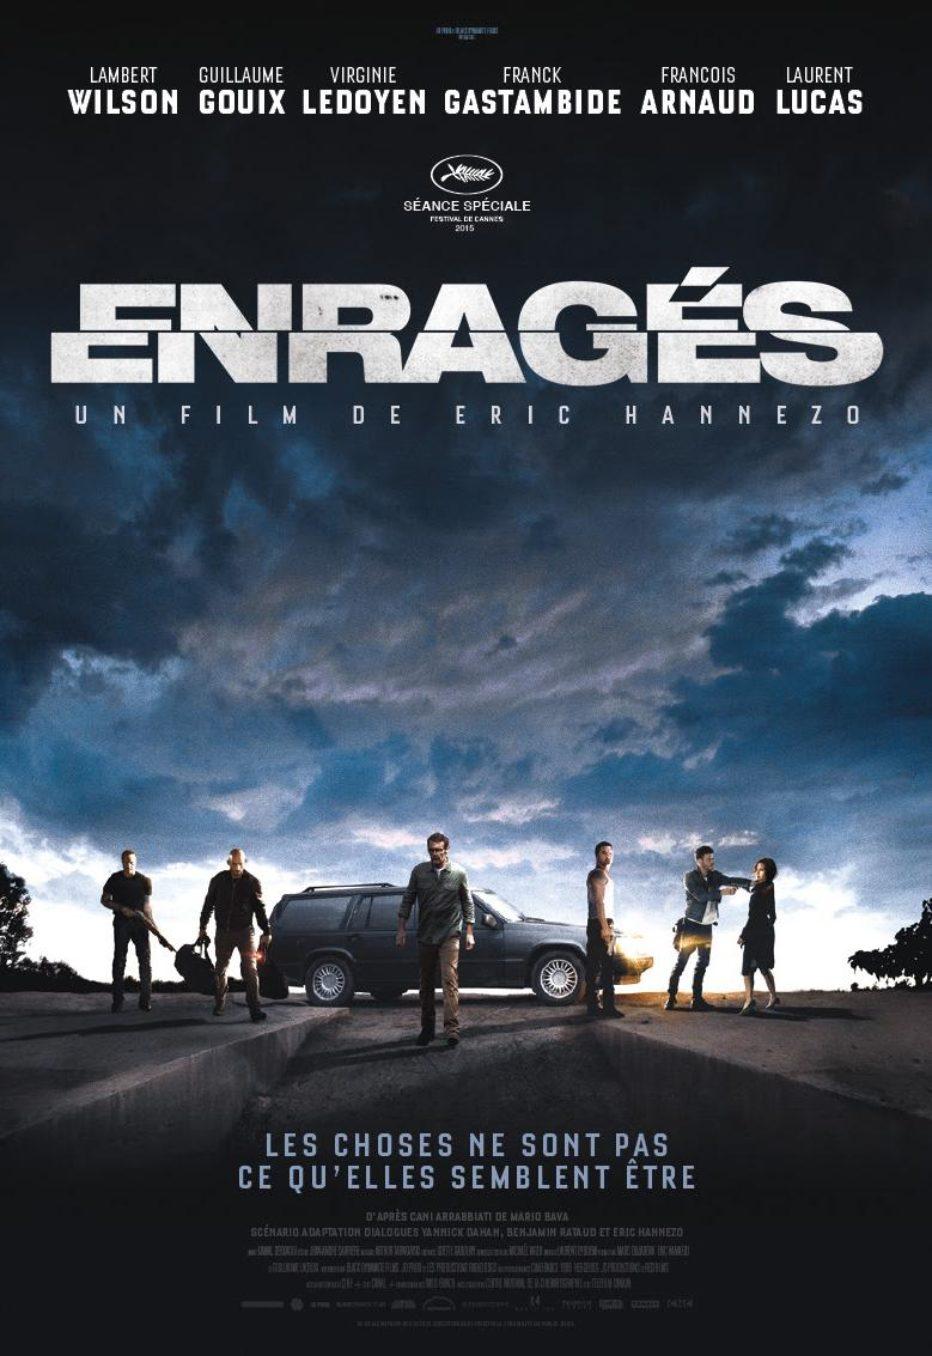 Enragés #Sitges2015